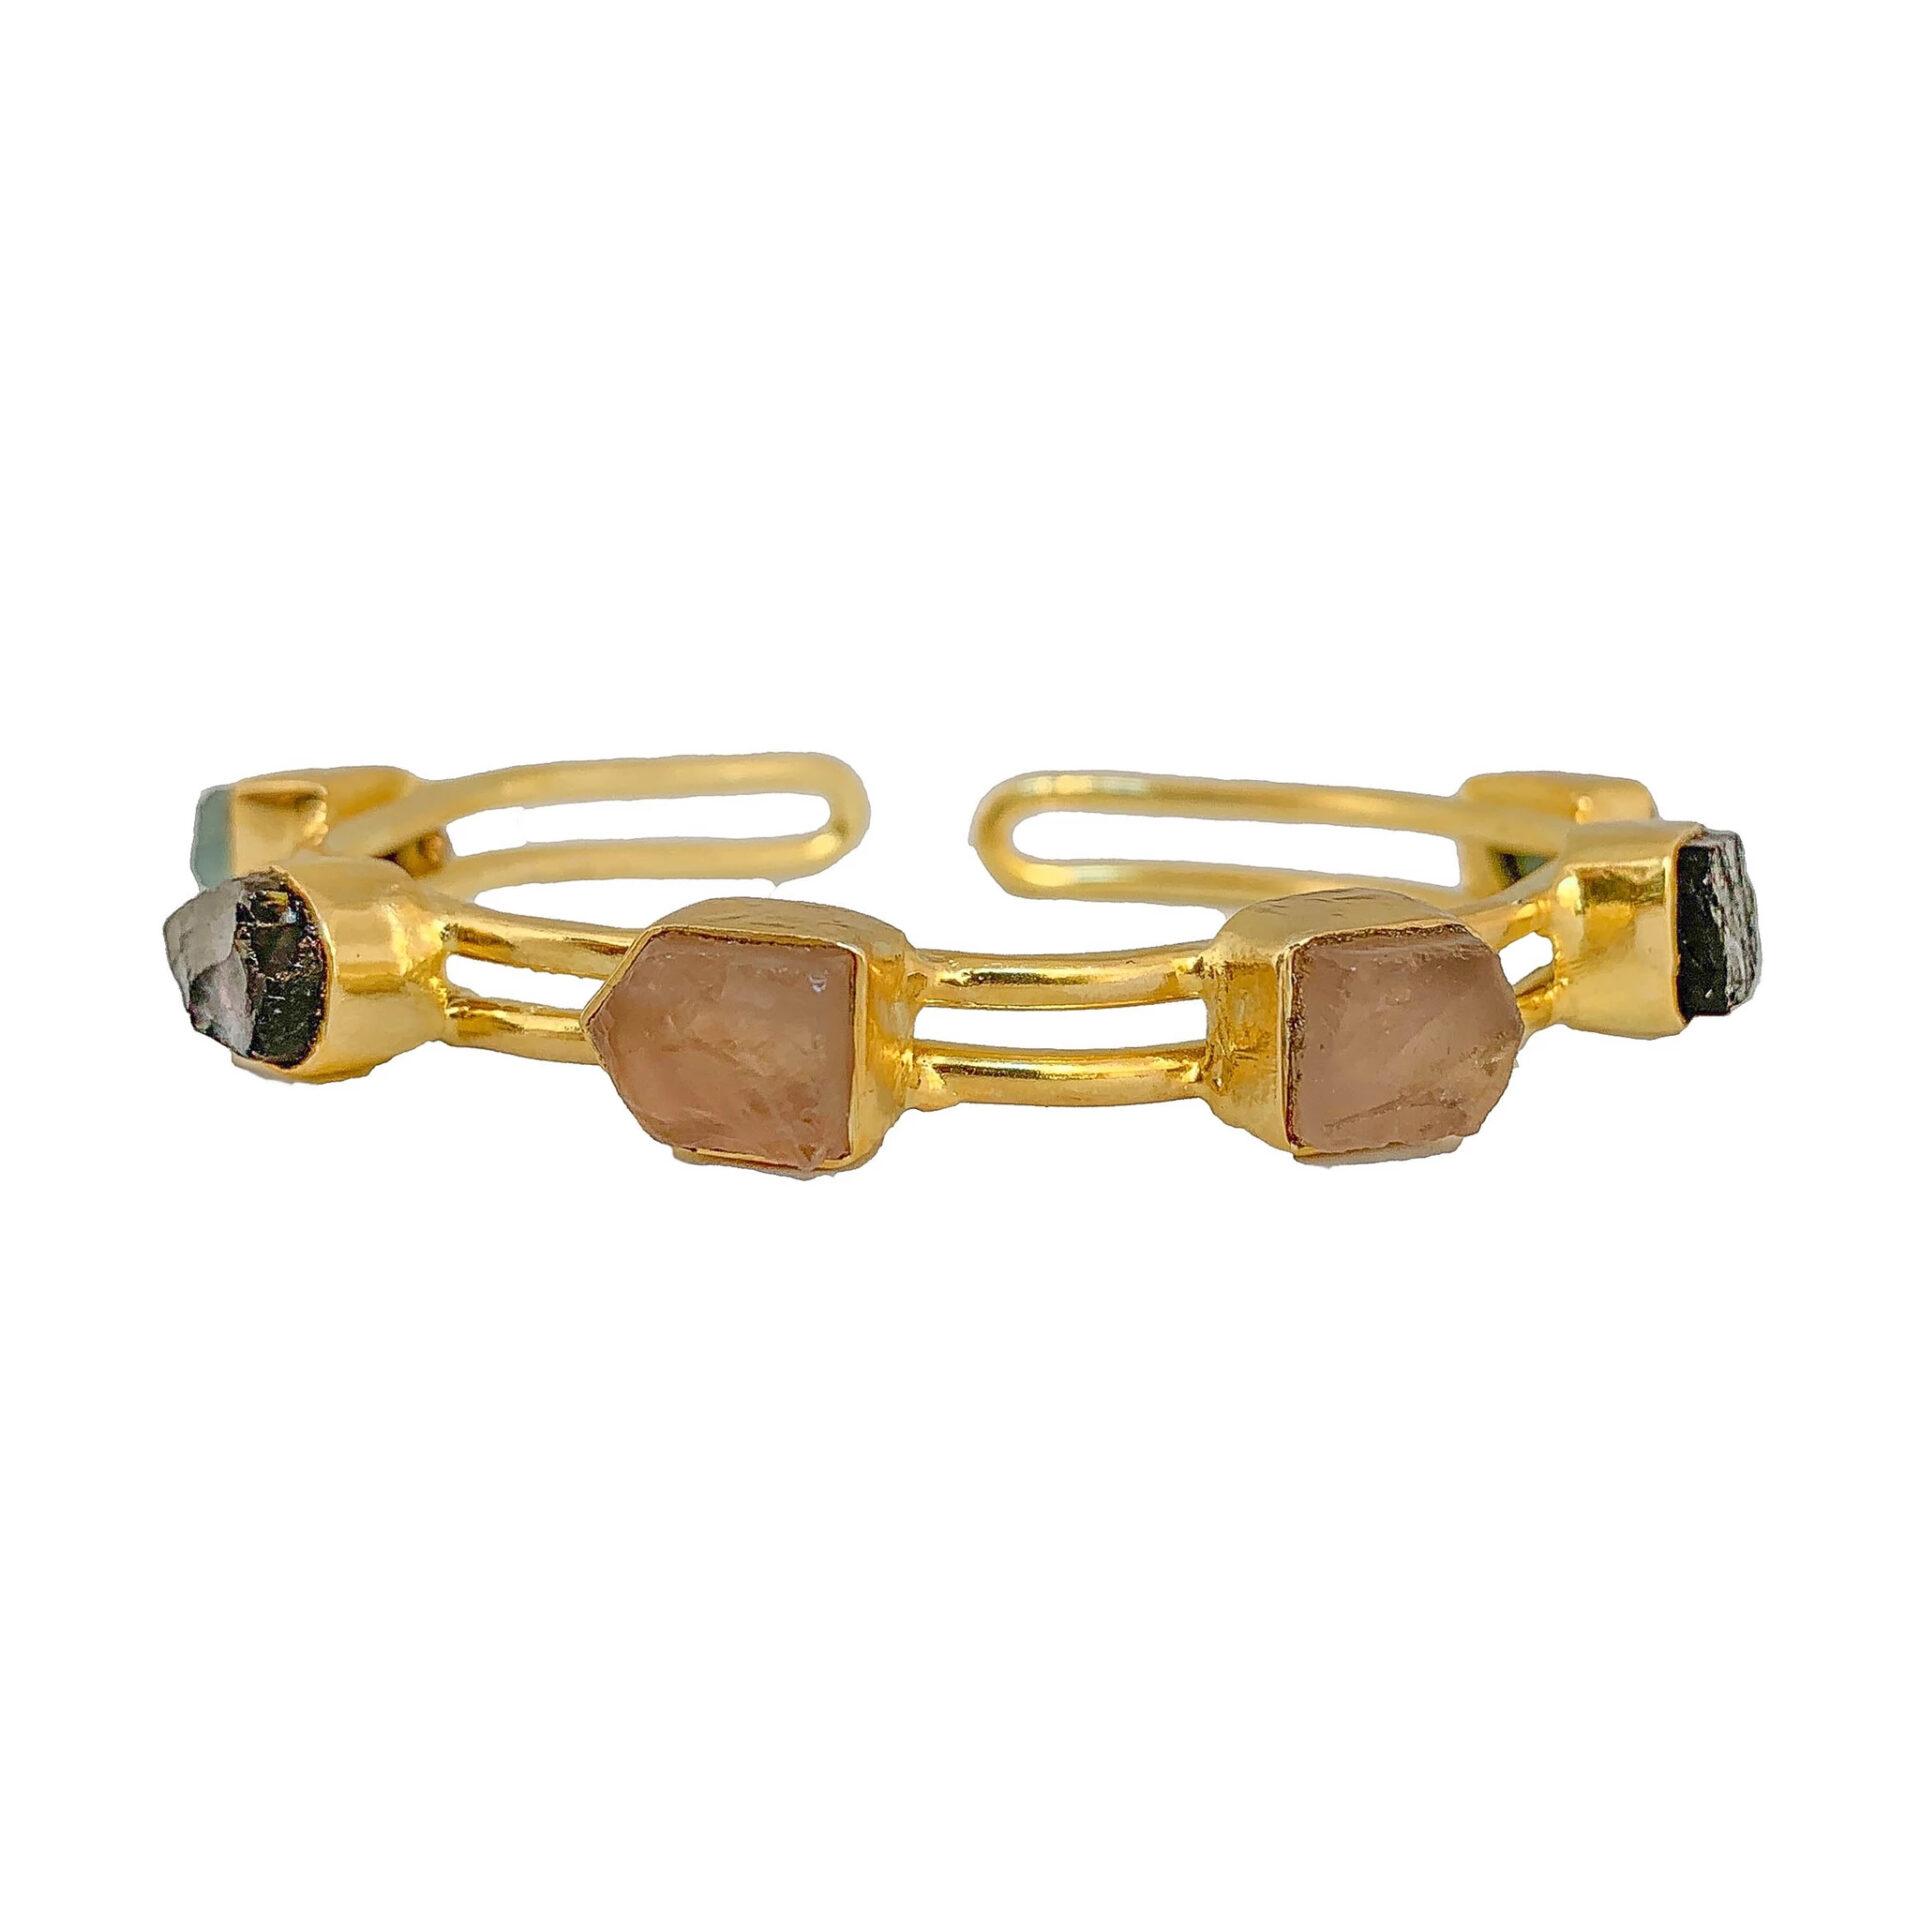 Tanya litkovska Women's Merry Go Round Cuff Bracelet